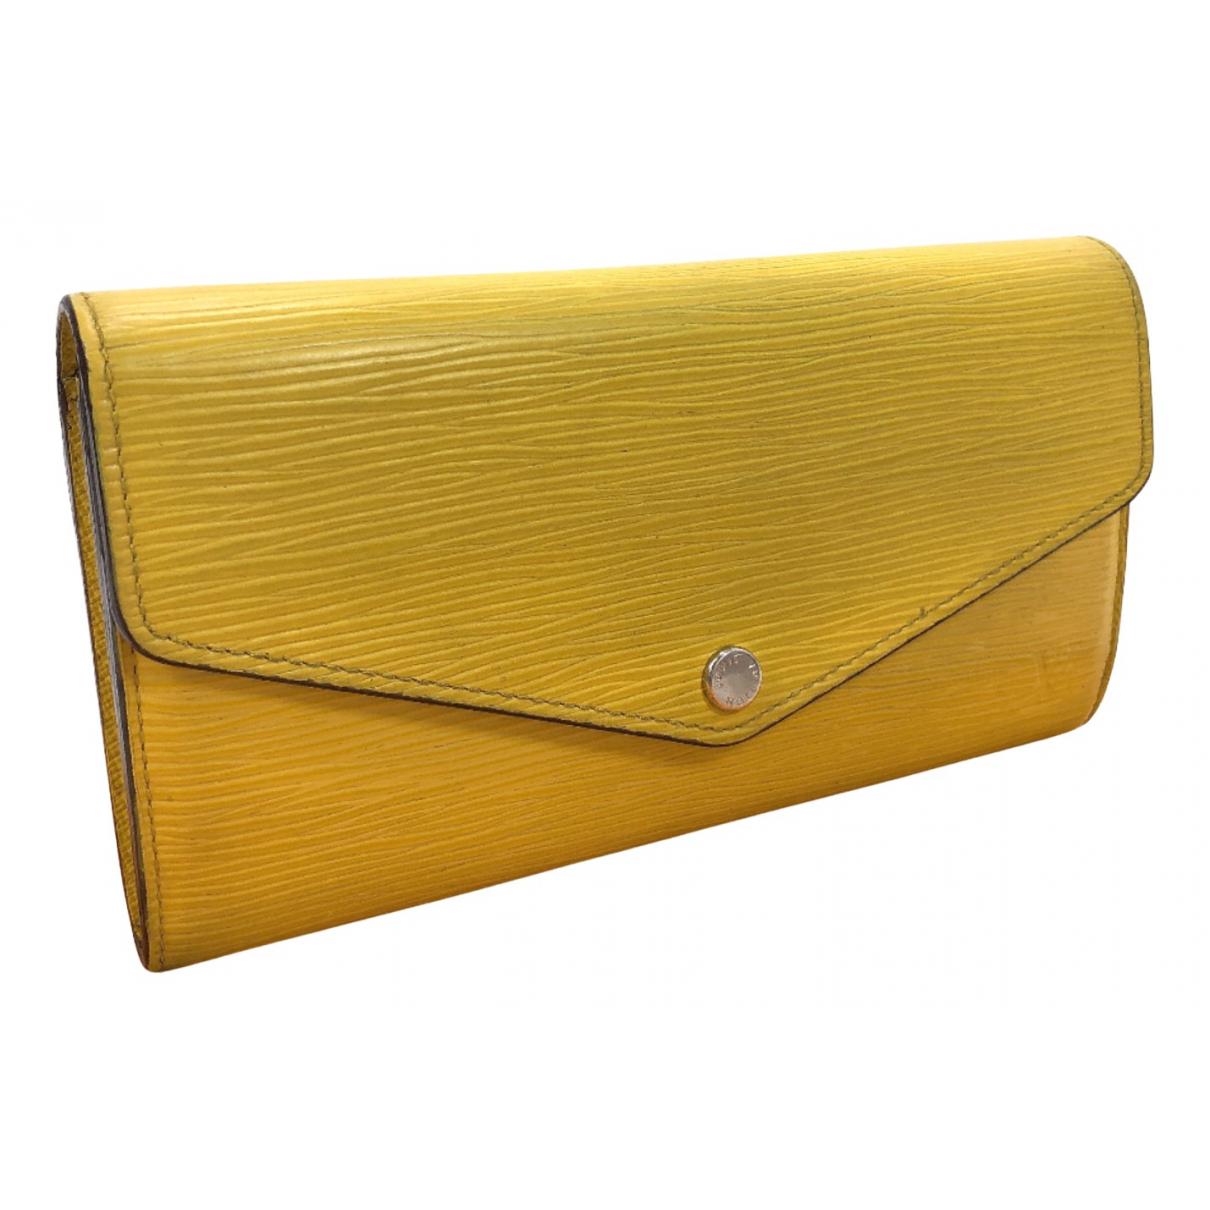 Louis Vuitton Sarah Portemonnaie in  Gelb Leder